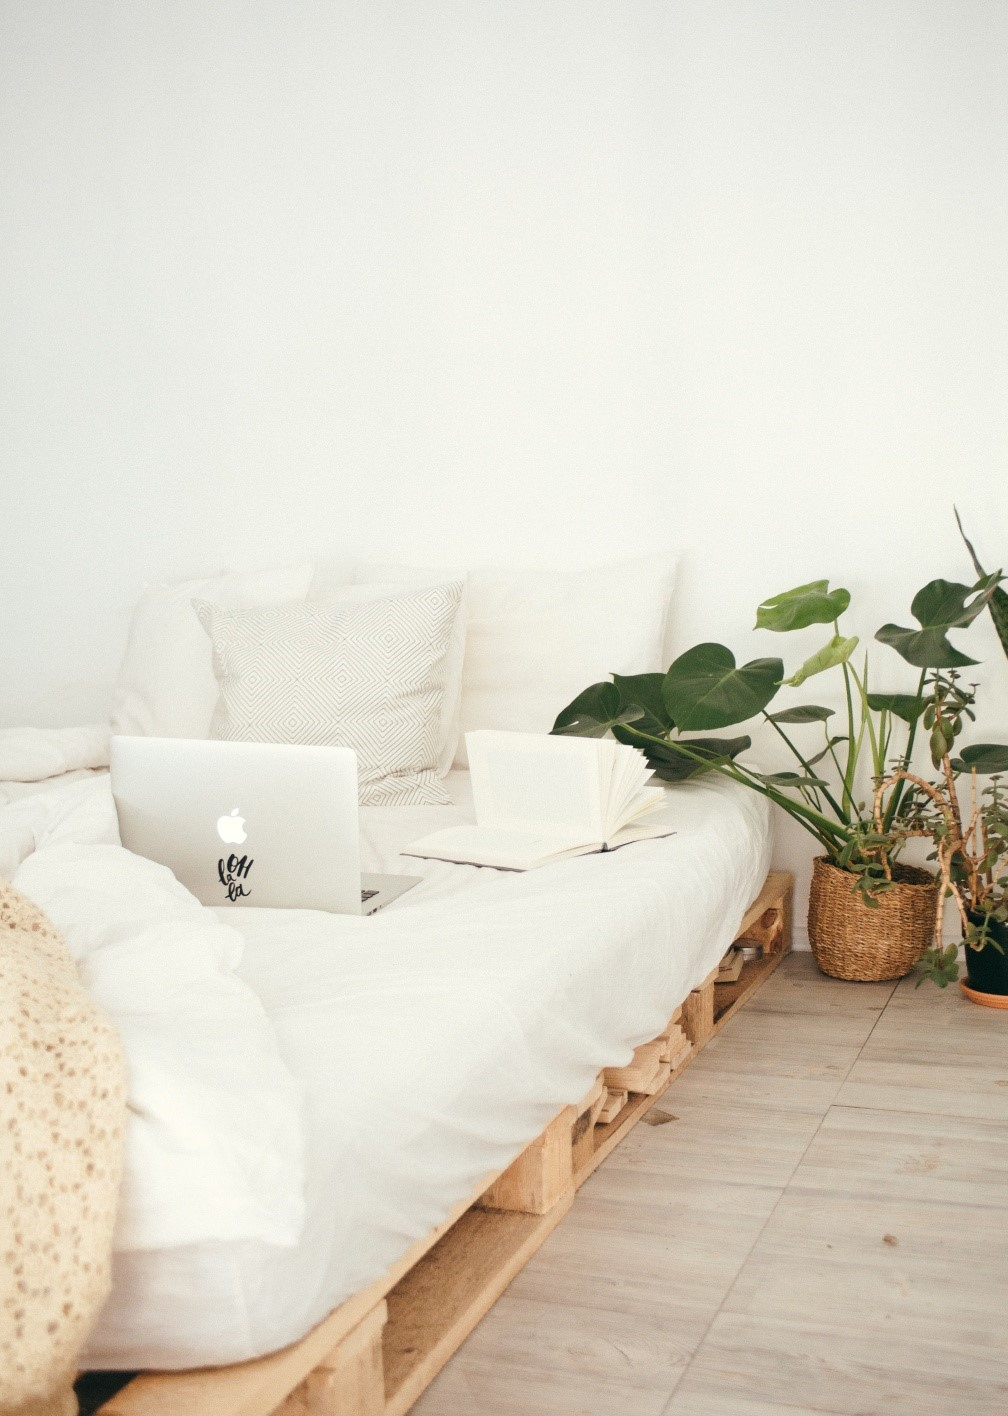 Decorating your farmhouse bedroom with lush farmhouse pillows